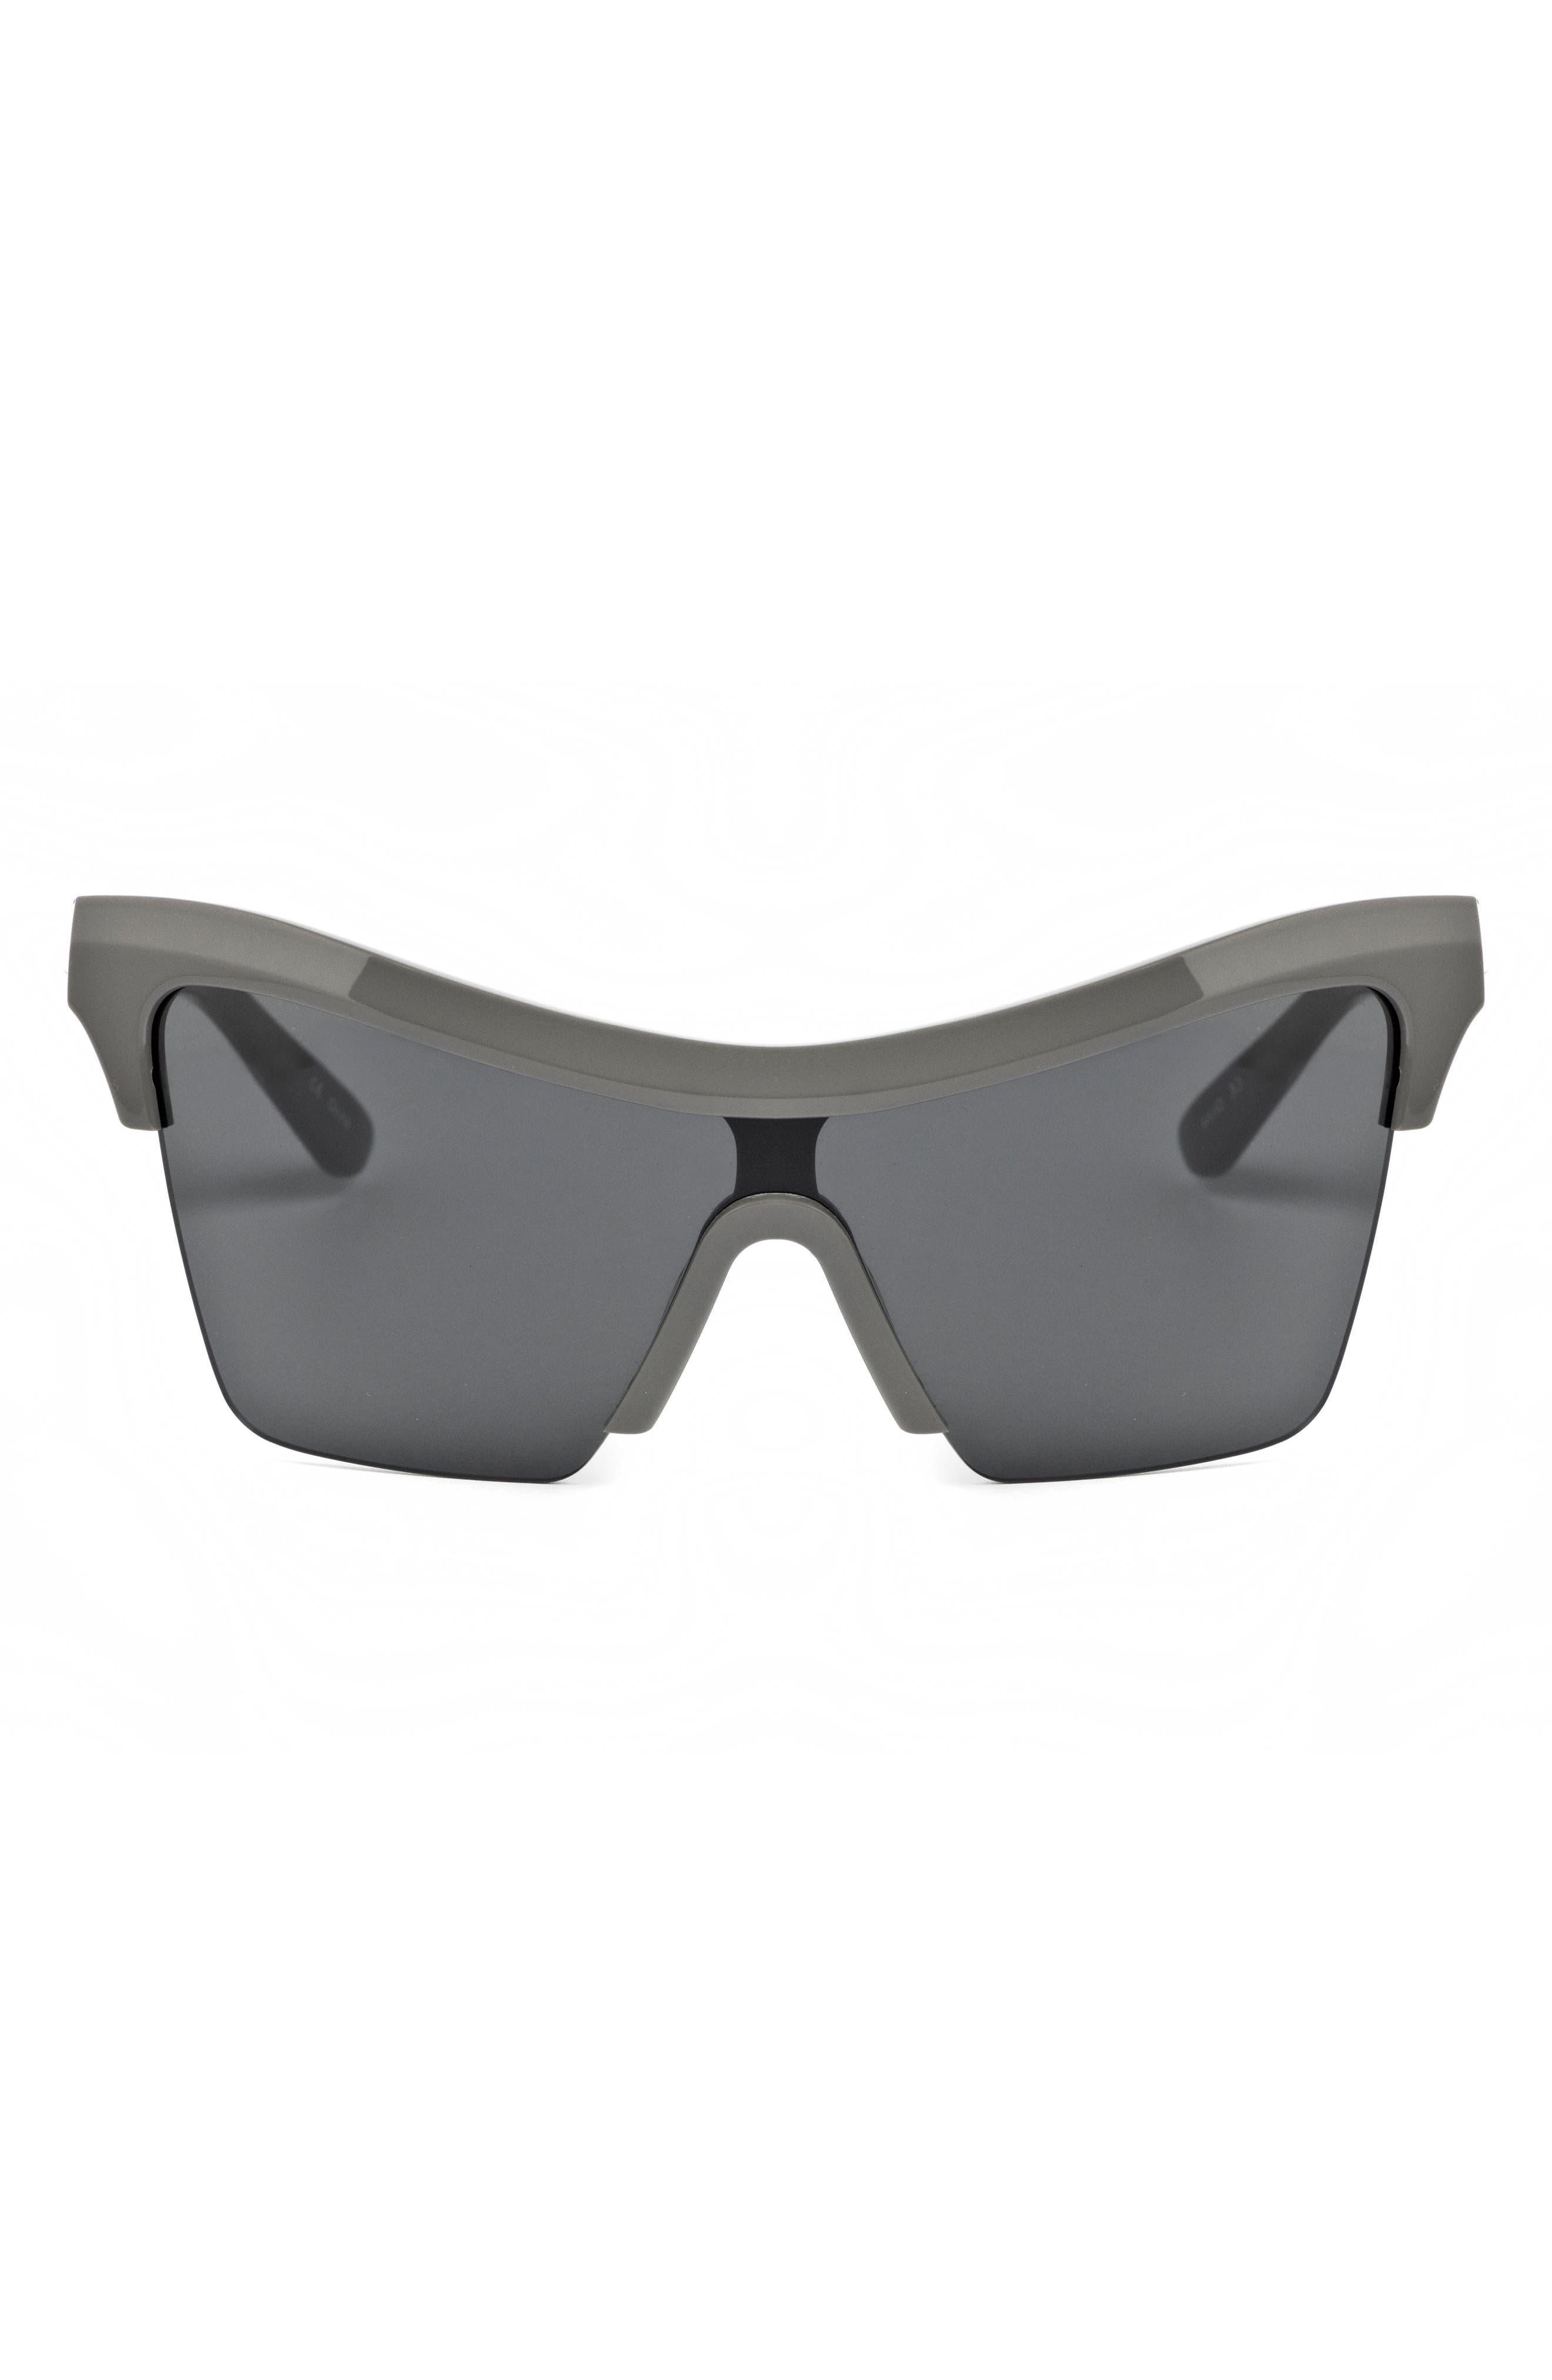 Passport Control 68mm Sunglasses,                             Alternate thumbnail 3, color,                             Grey